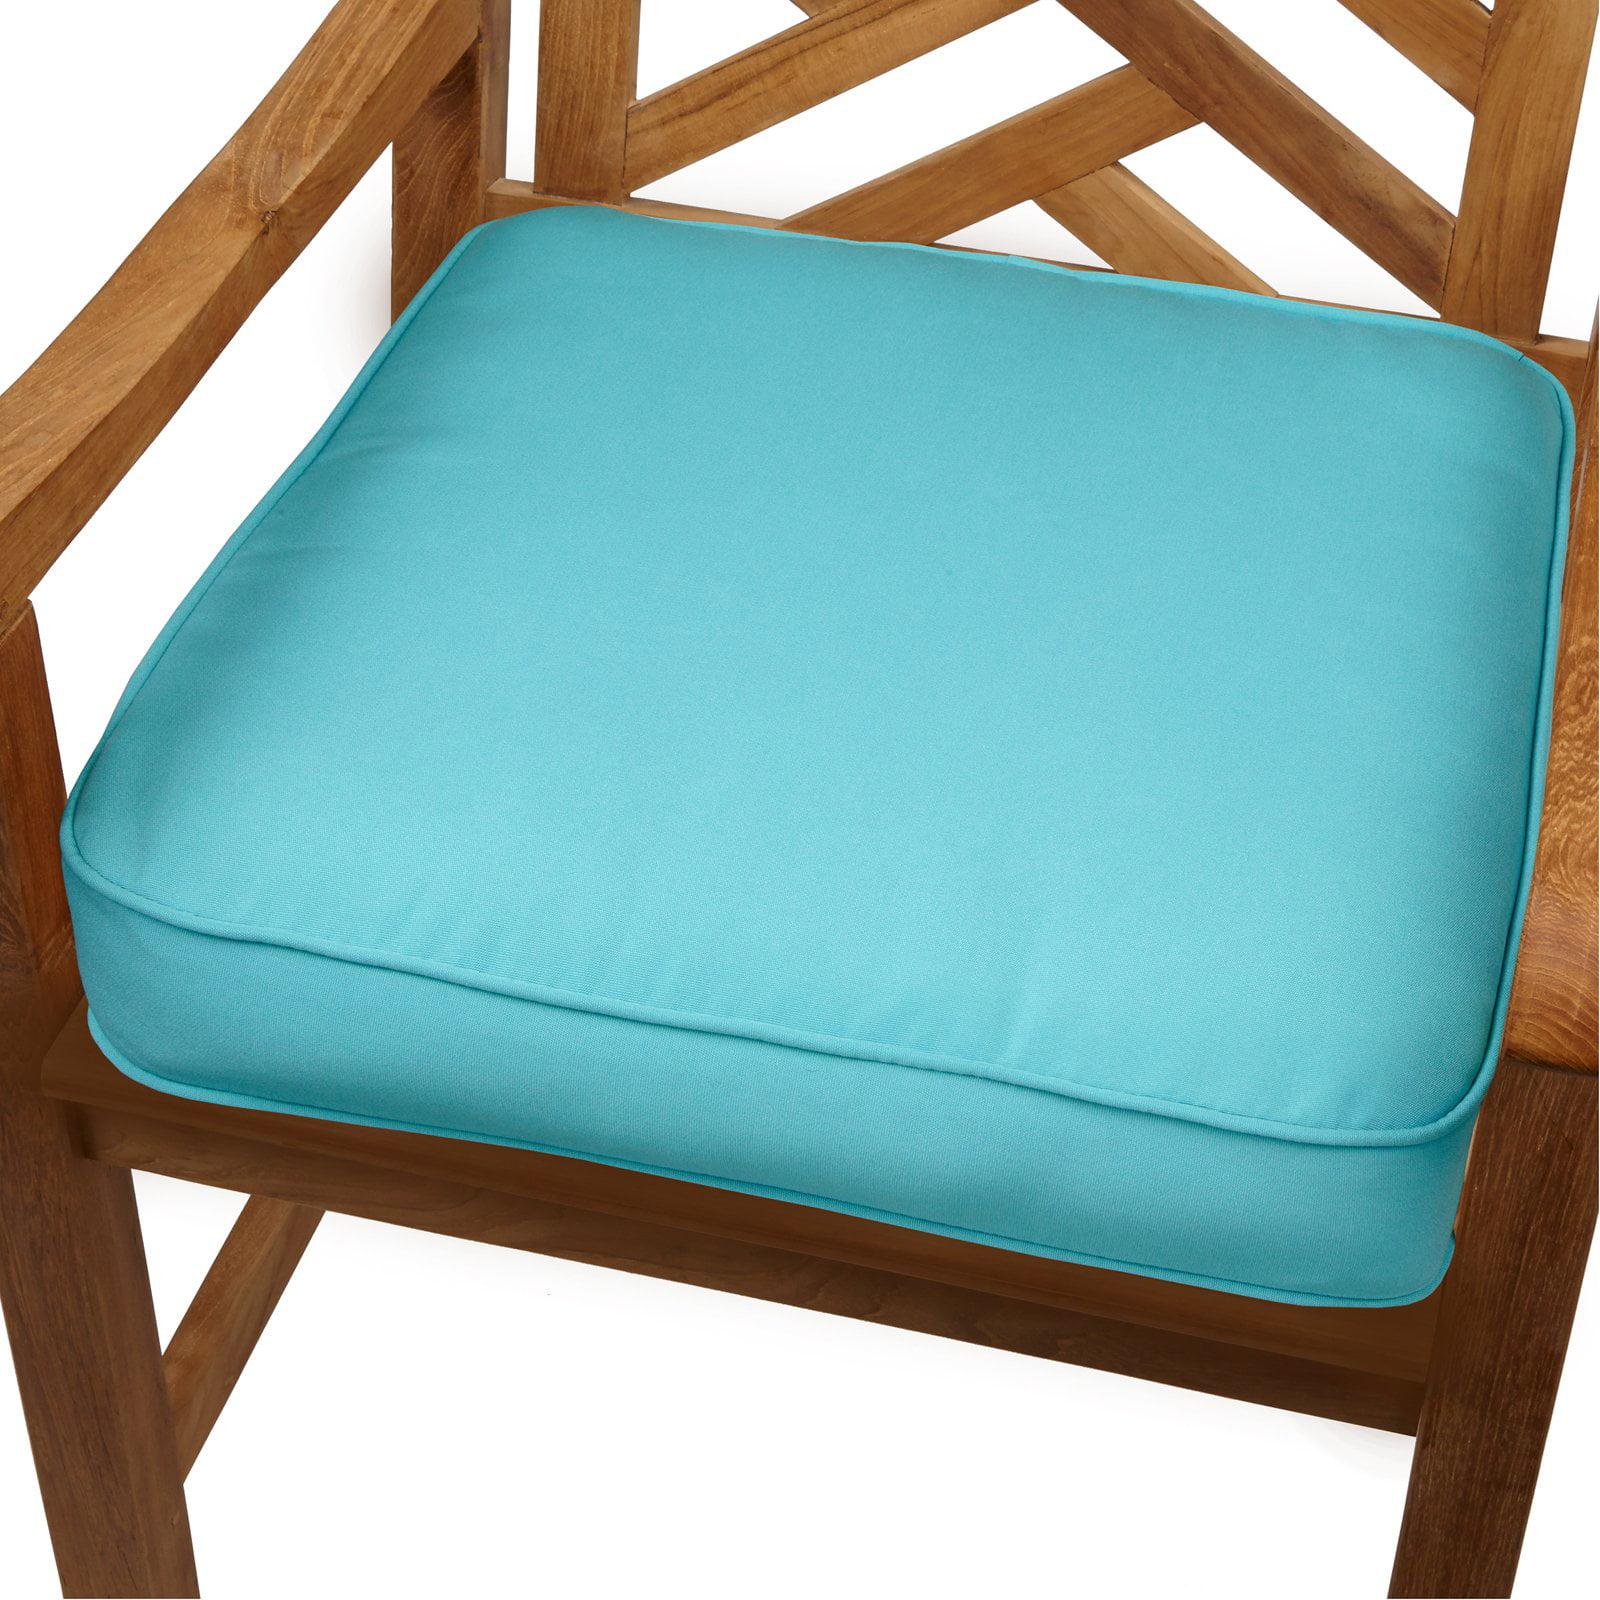 Etonnant Mozaic Company Sunbrella Corded Indoor/Outdoor Chair Cushion   Walmart.com